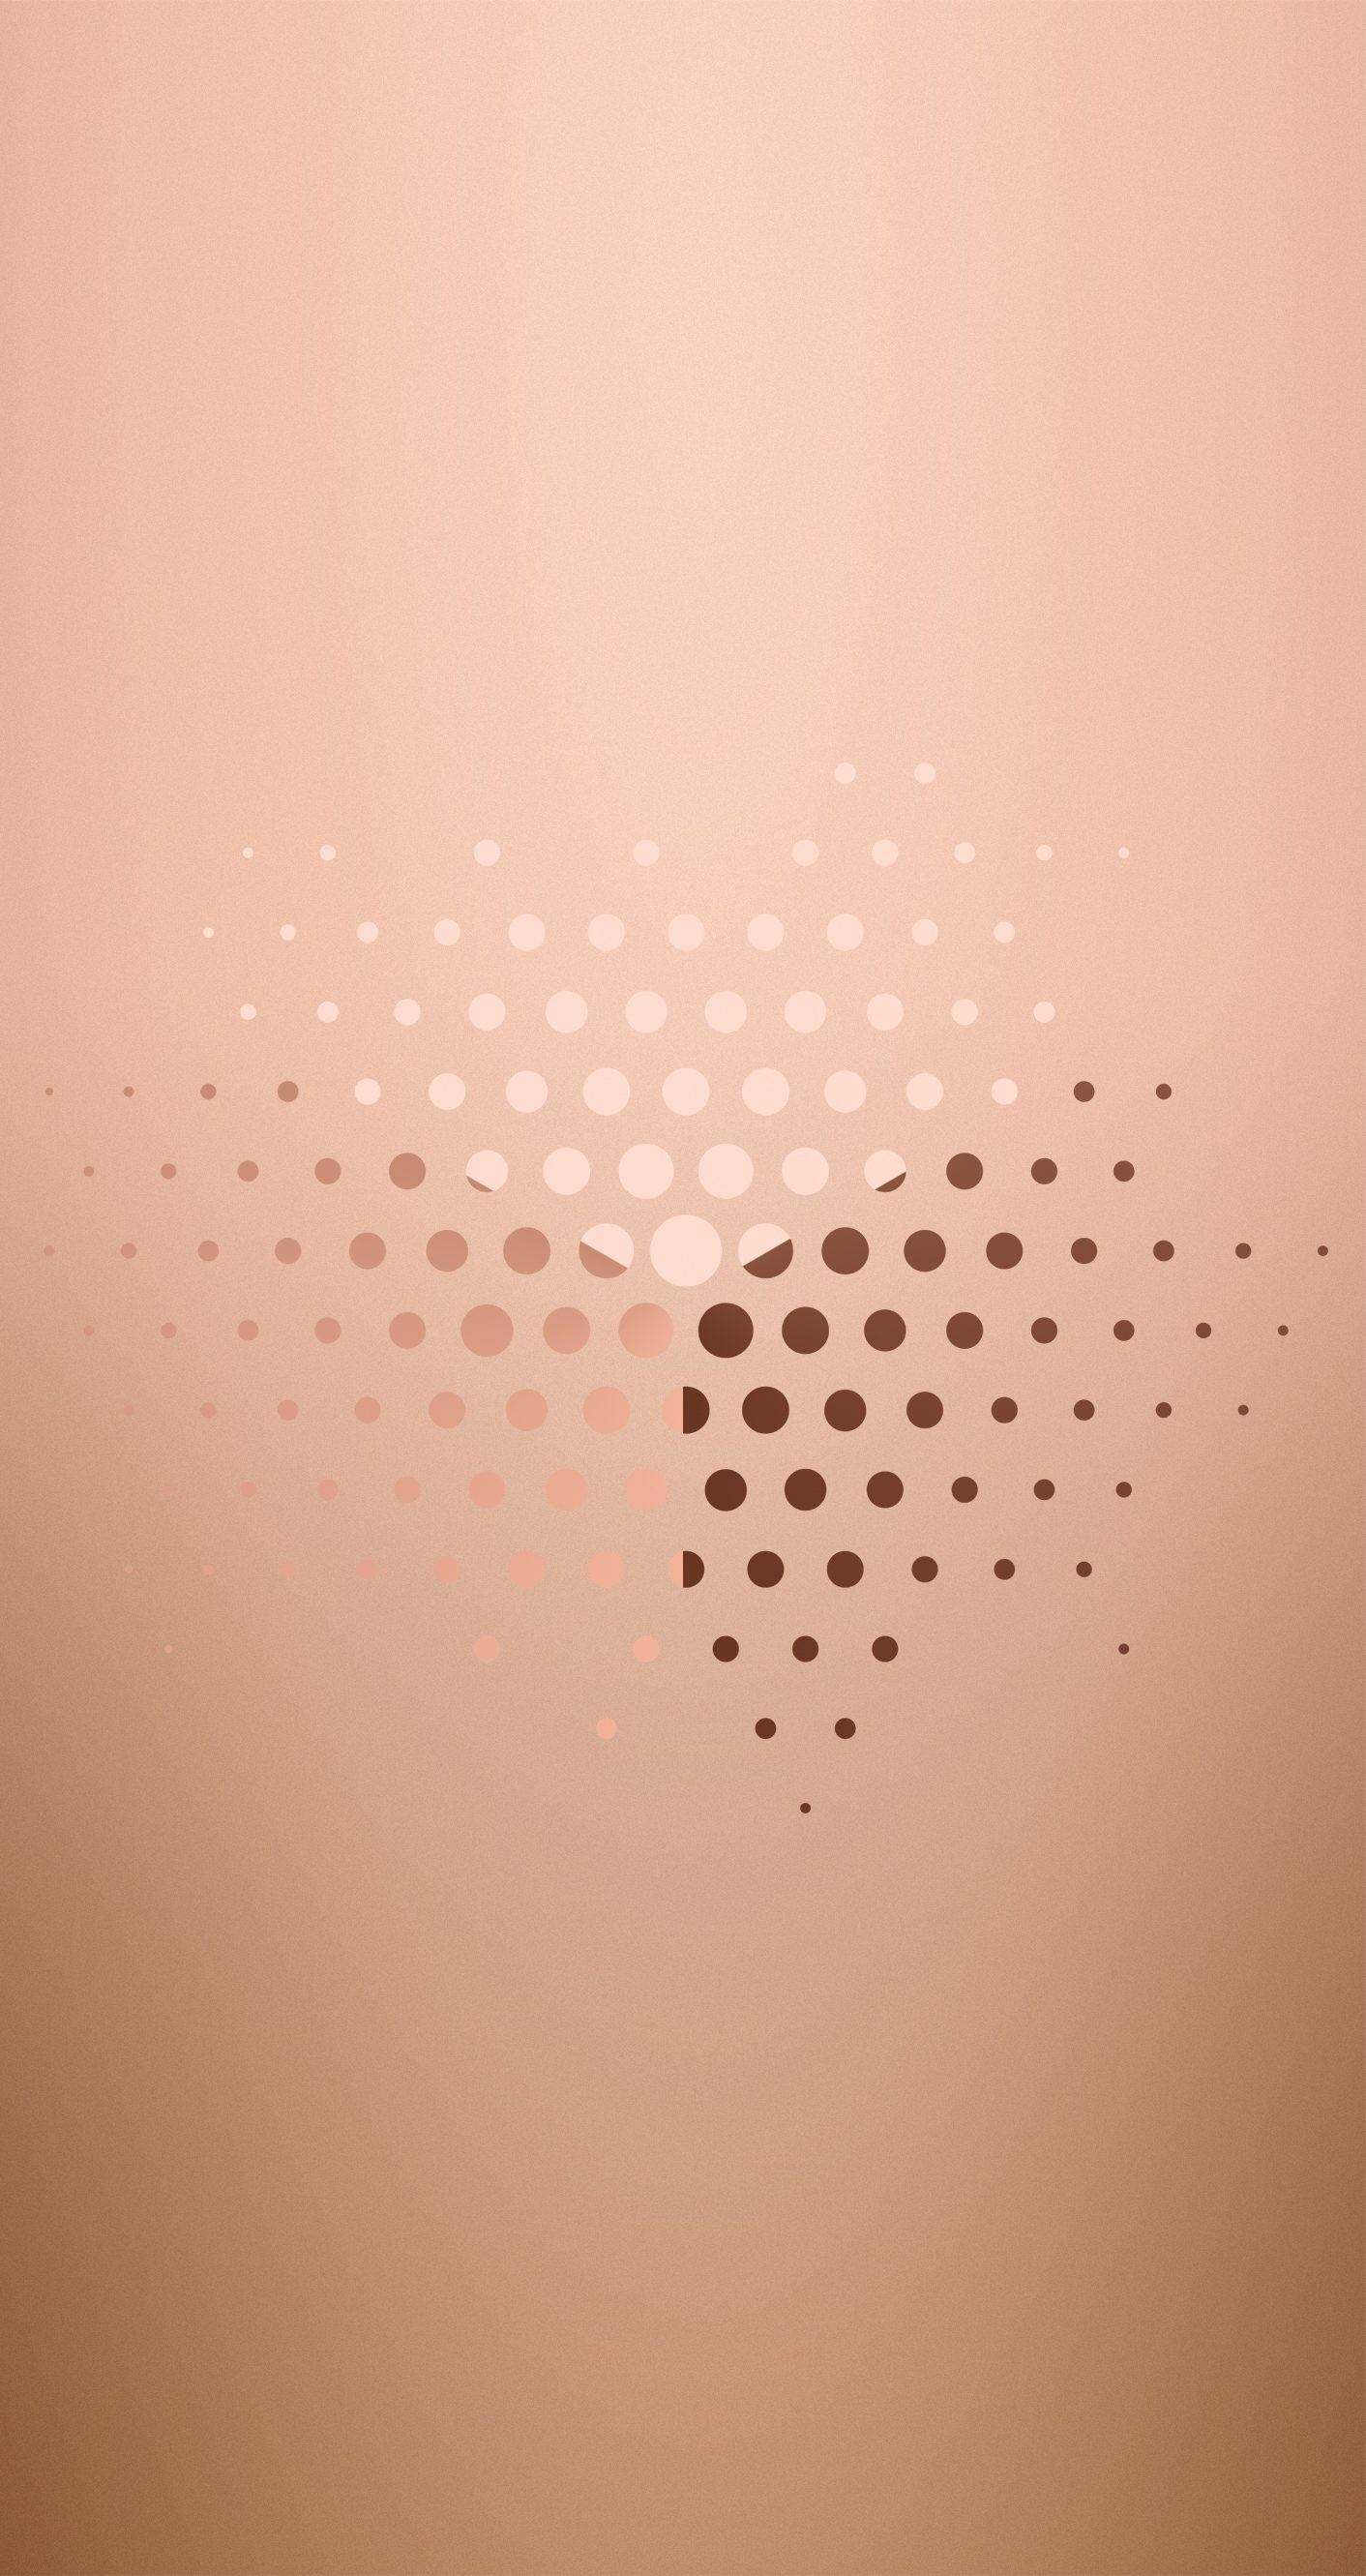 Rose Gold Iphone Wallpaper – Wallpapersafari pertaining to Wallpaper Rose  Gold